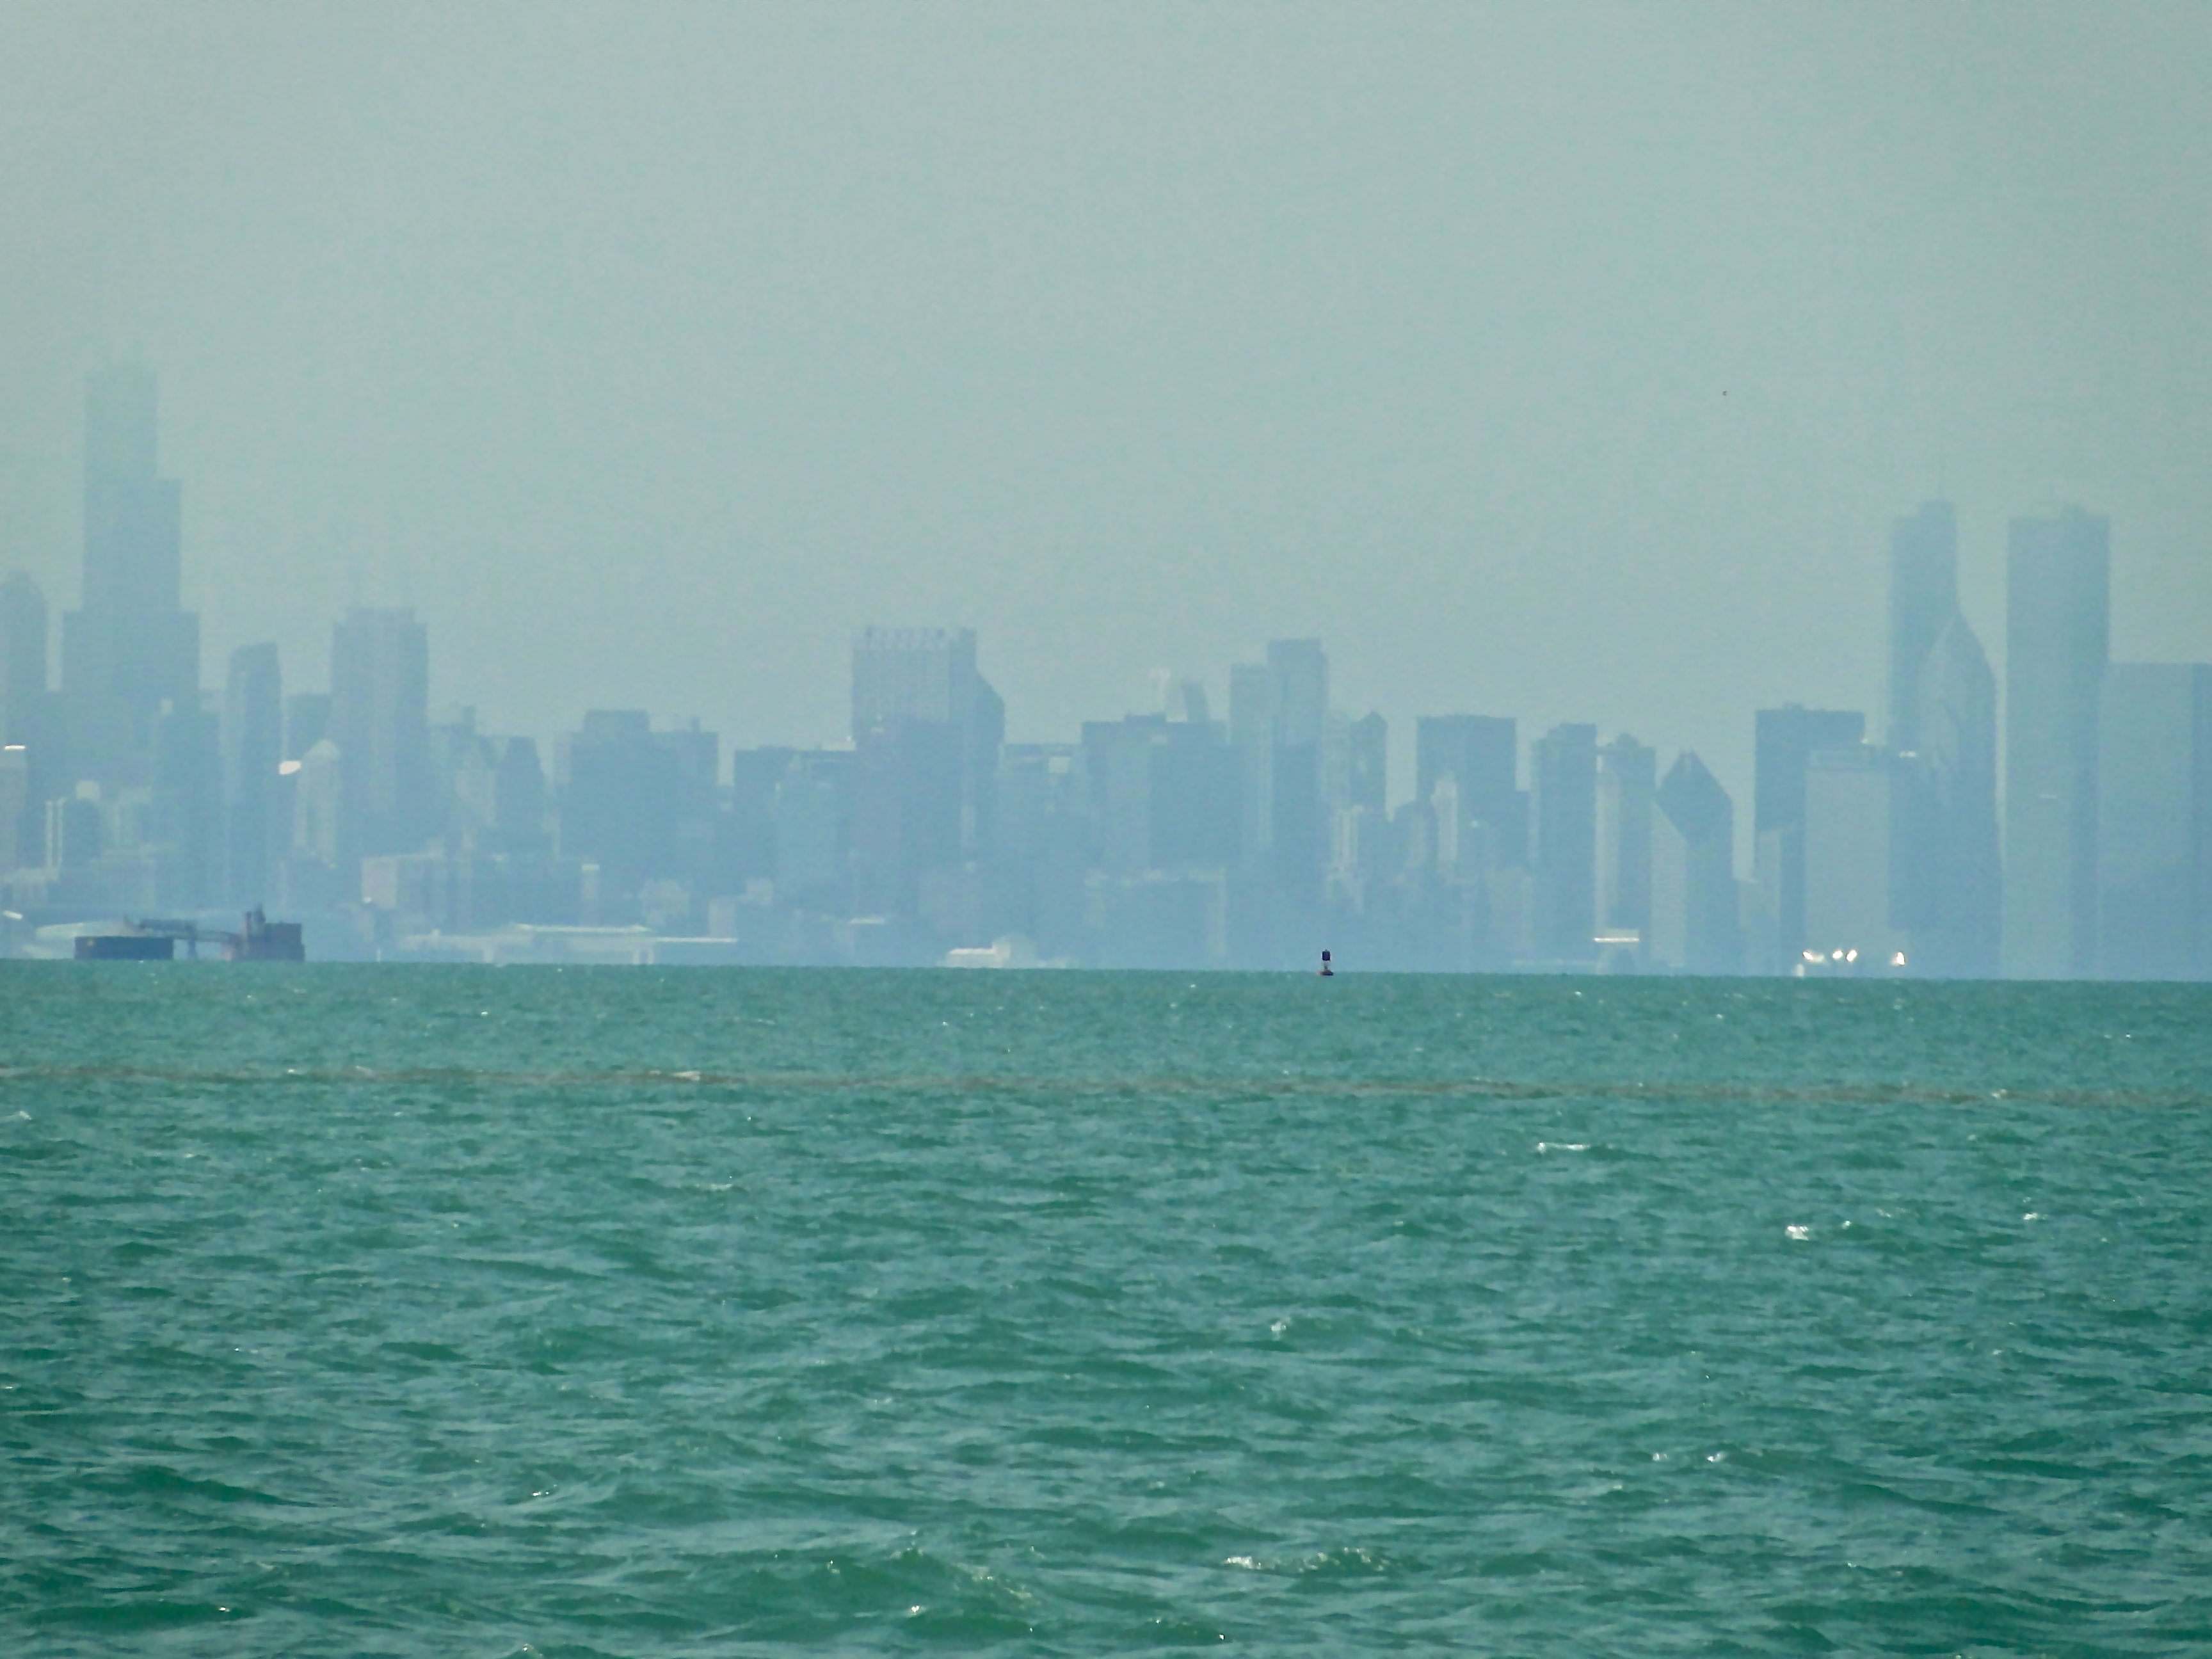 weather channel lake, il